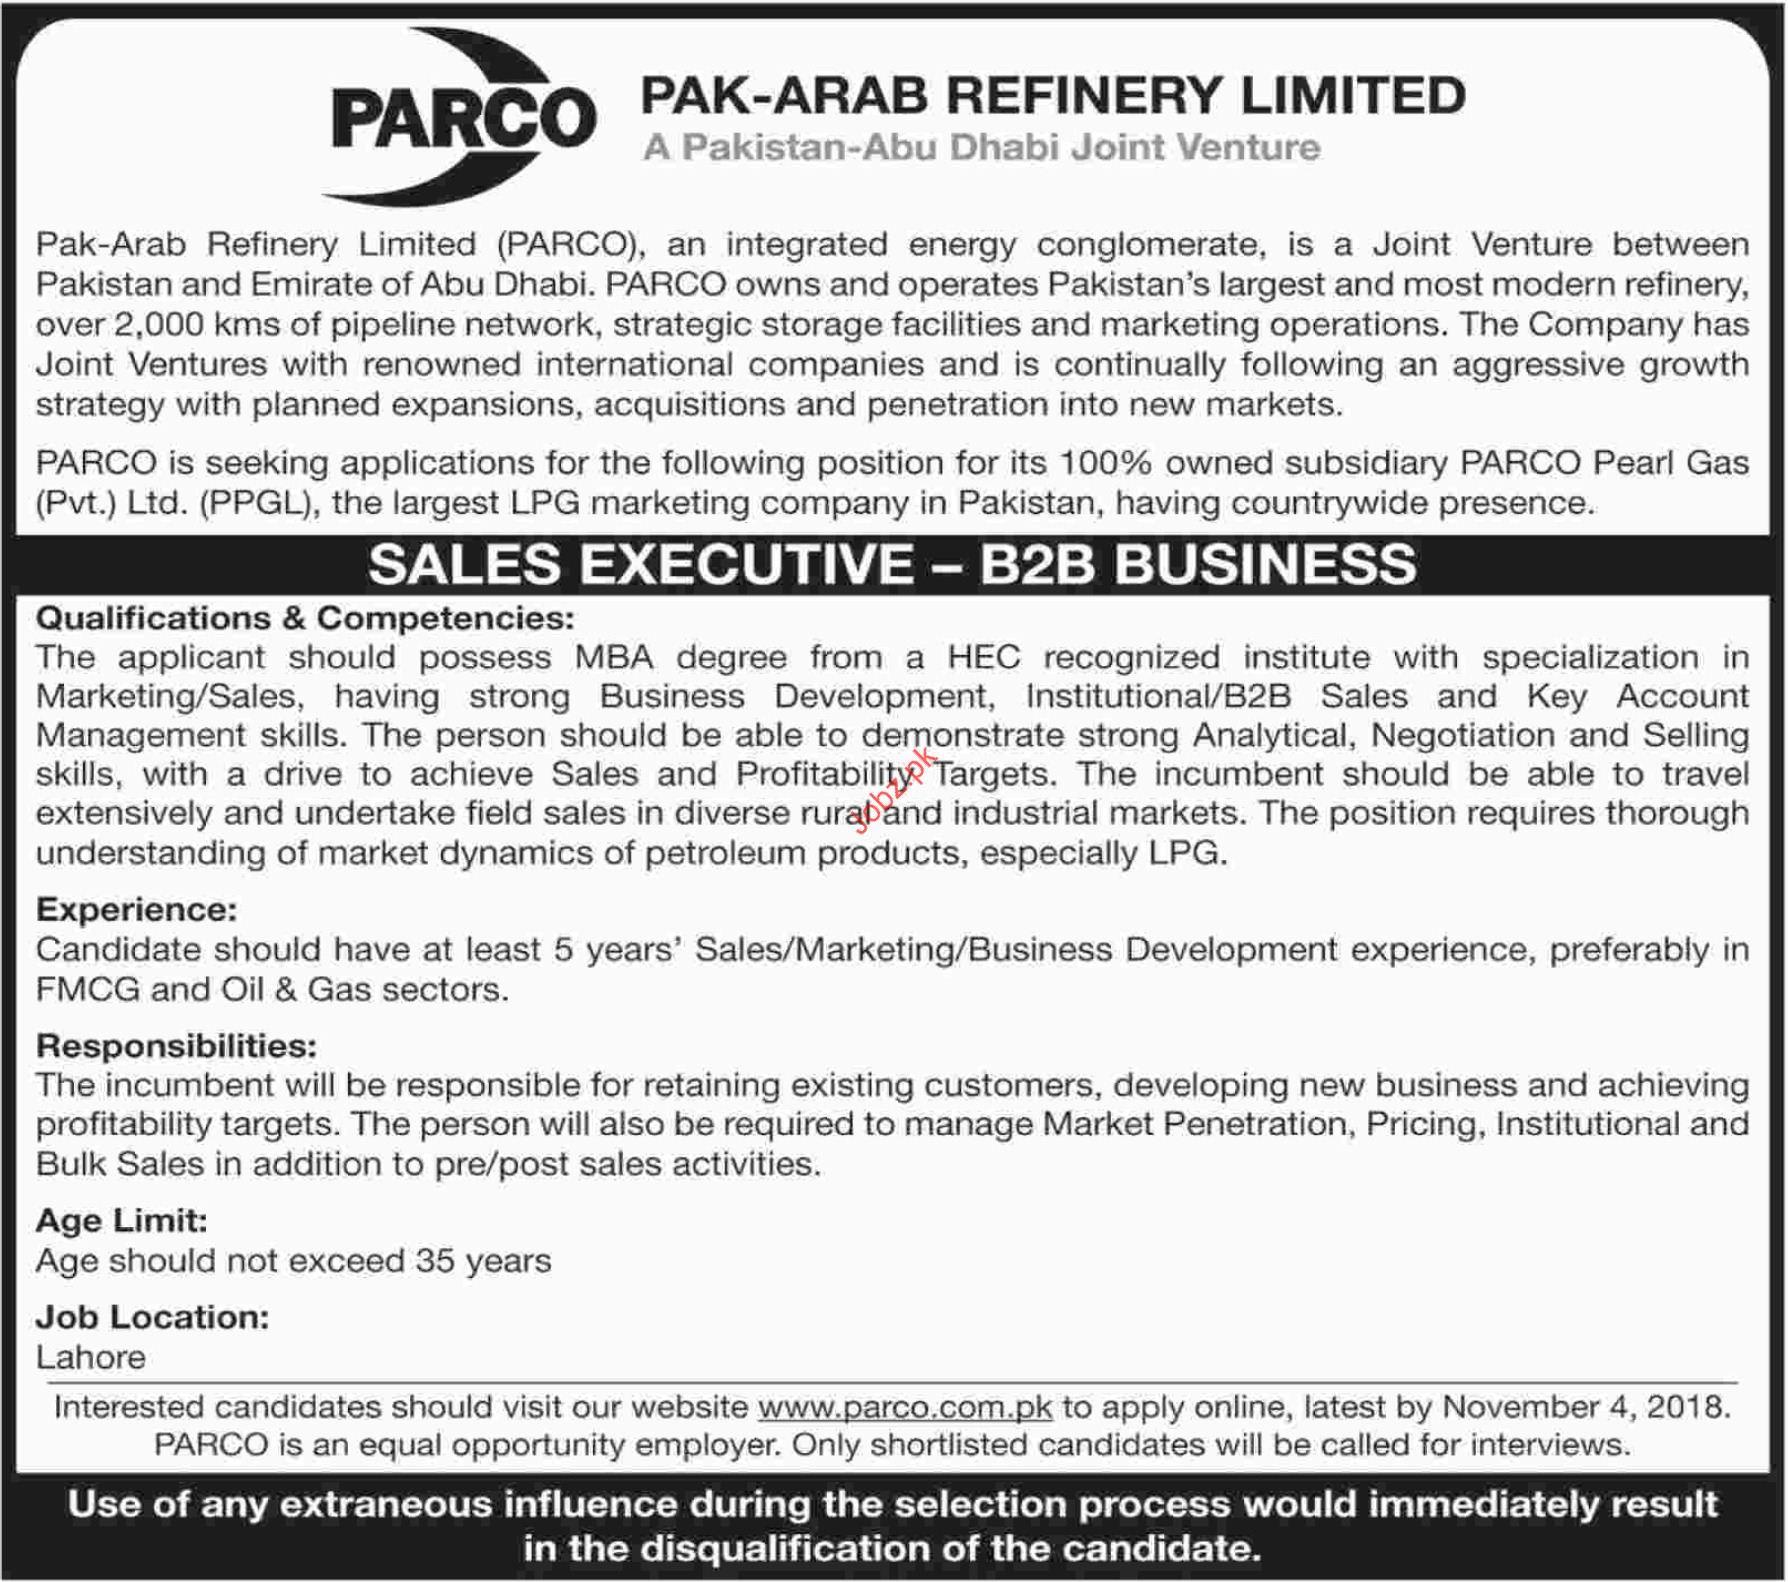 PARCO Sales Executive Jobs 2018